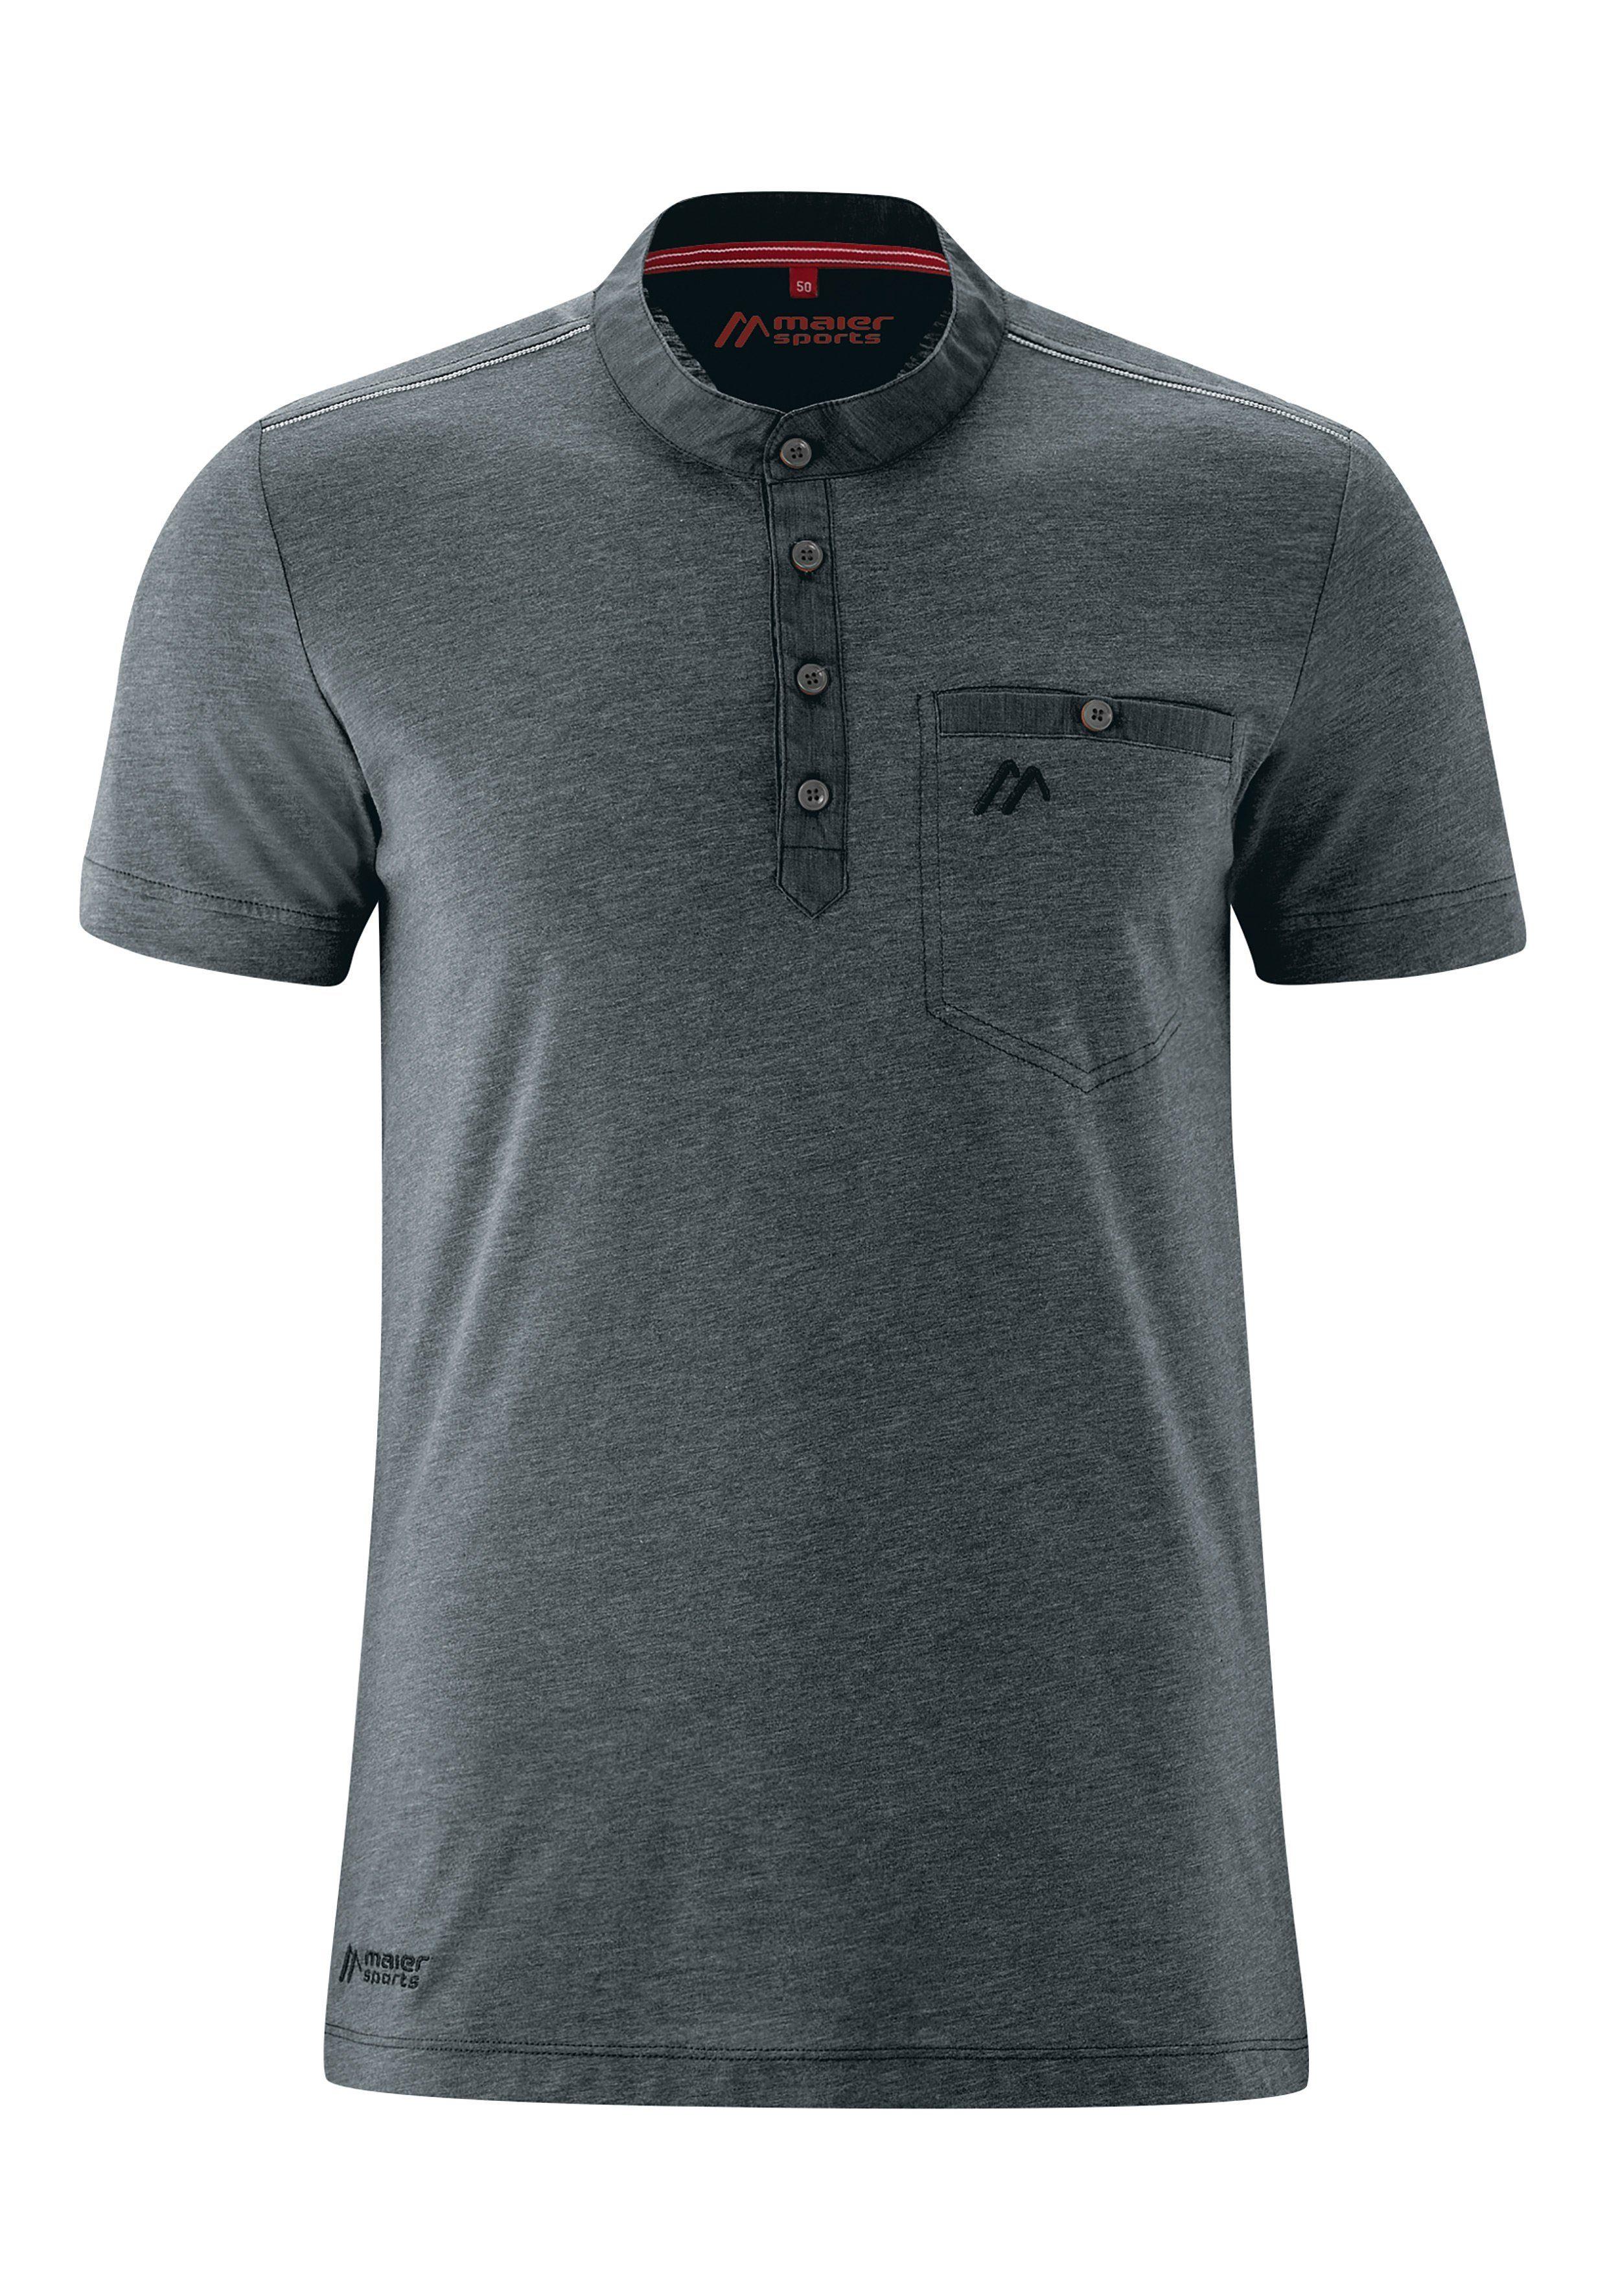 Maier Sports Funktionsshirt Doolin S/S M | Sportbekleidung > Sportshirts > Funktionsshirts | Grau | Maier Sports